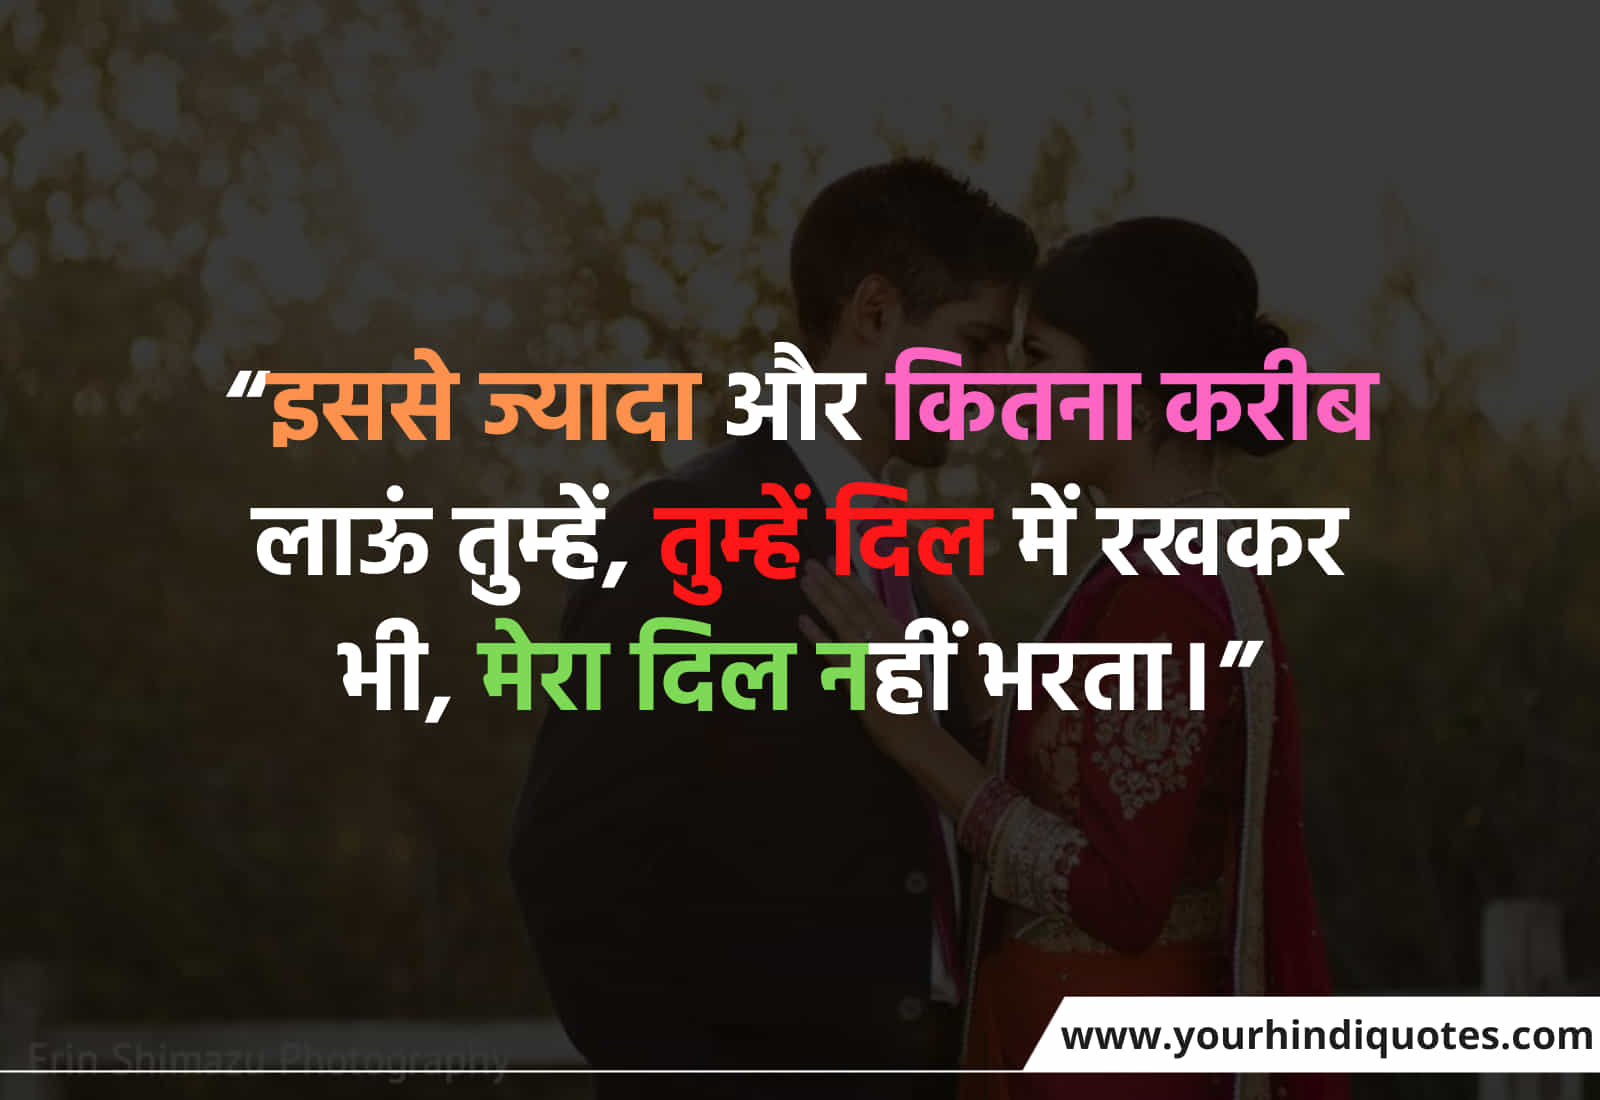 Hindi Love Shayari For Relationship